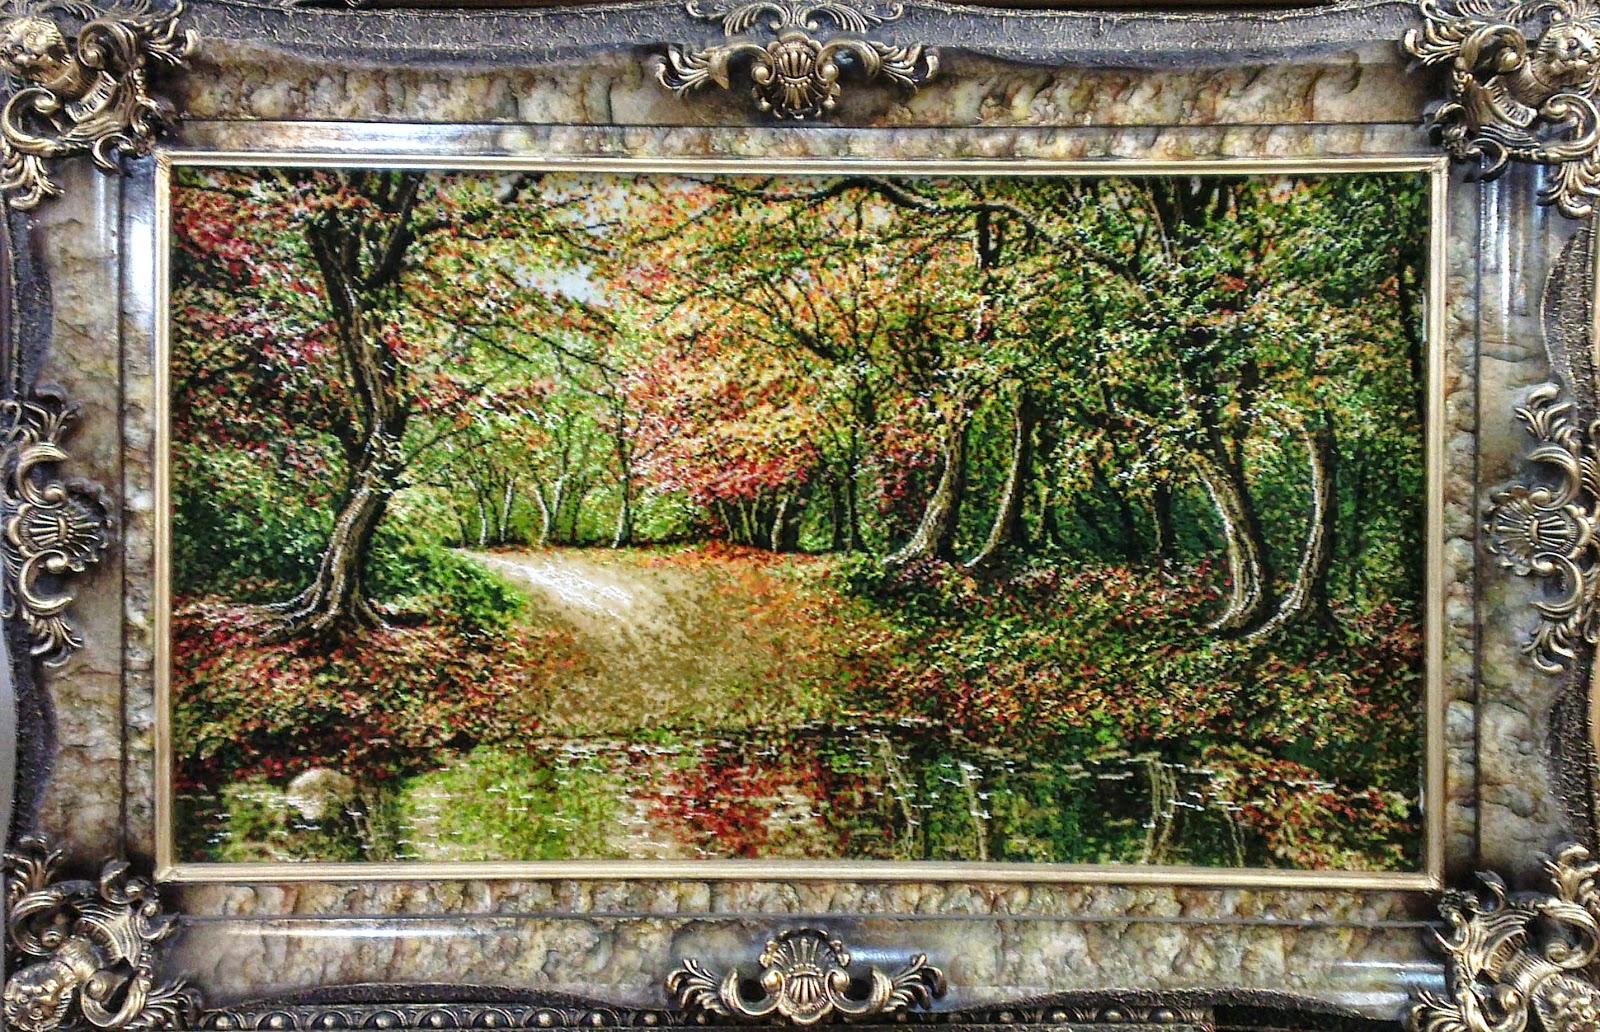 http://anafarsh.com/%D9%85%D9%86%D8%B8%D8%B1%D9%87/handmade-Pictorial-Carpets-Views-Lagoon